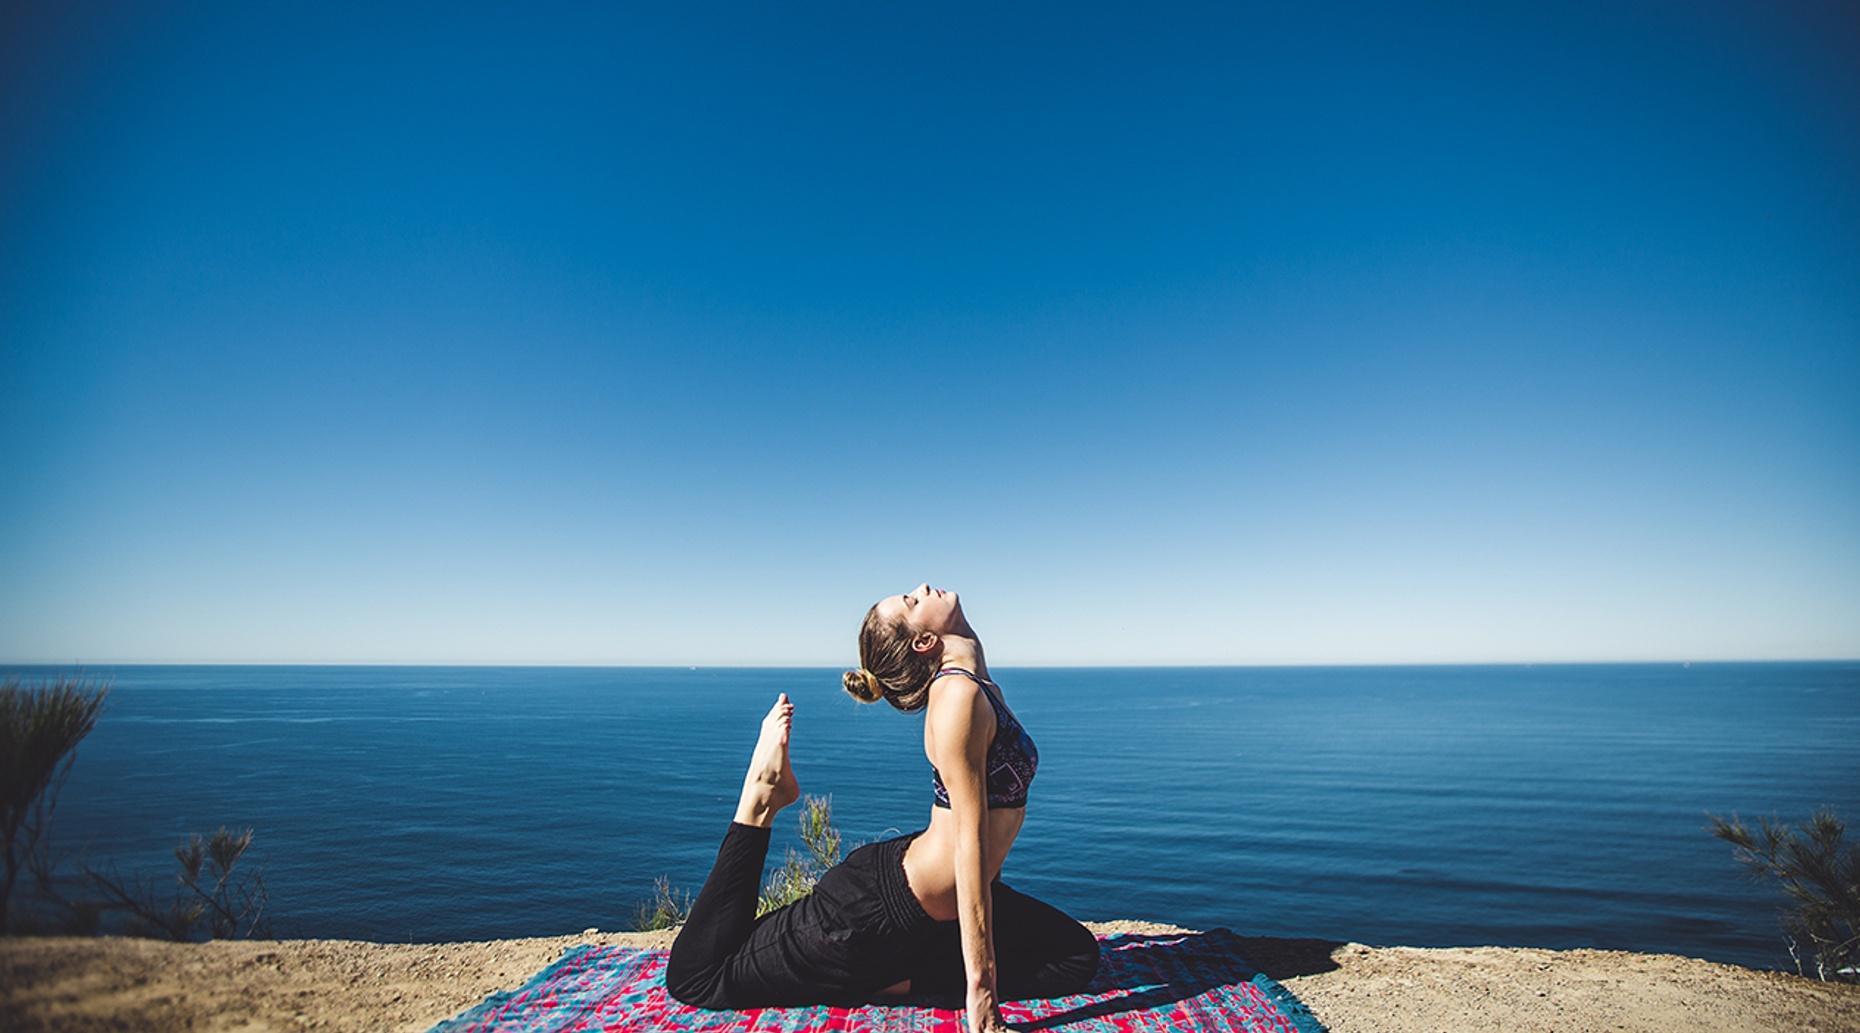 Awakening Yoga Retreat in Mexico